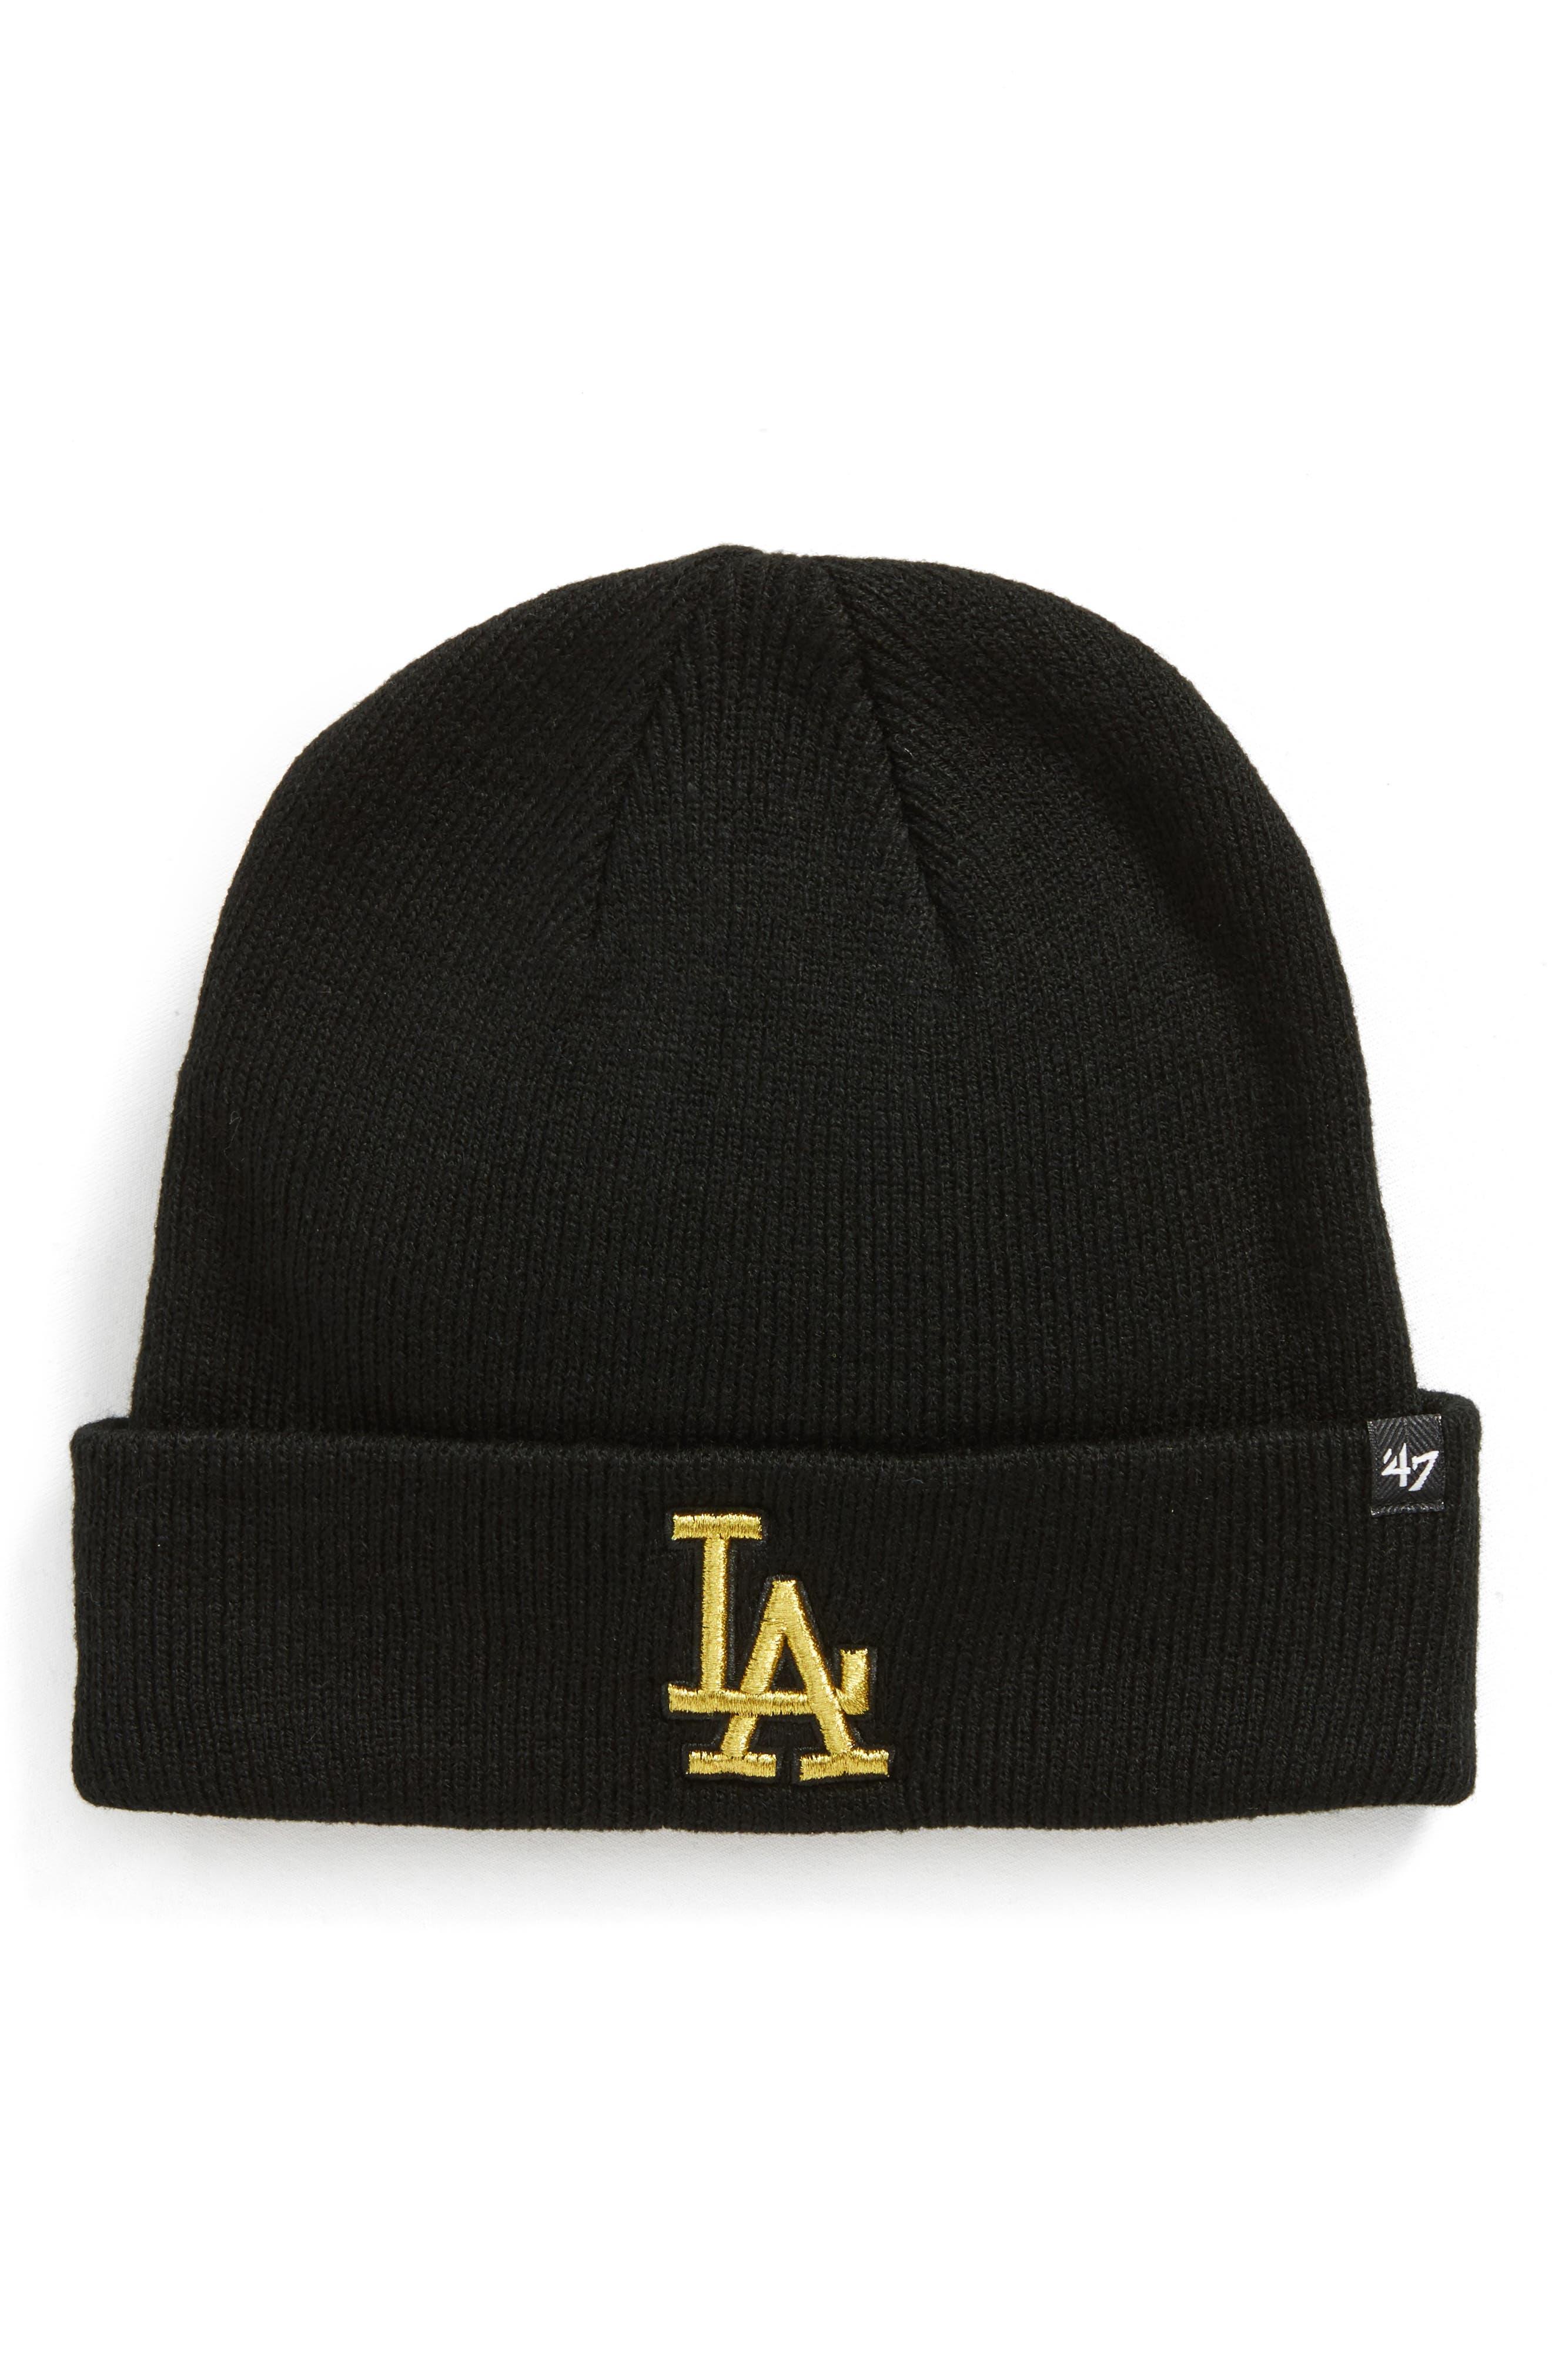 Los Angeles Dodgers Metallic Beanie,                         Main,                         color,